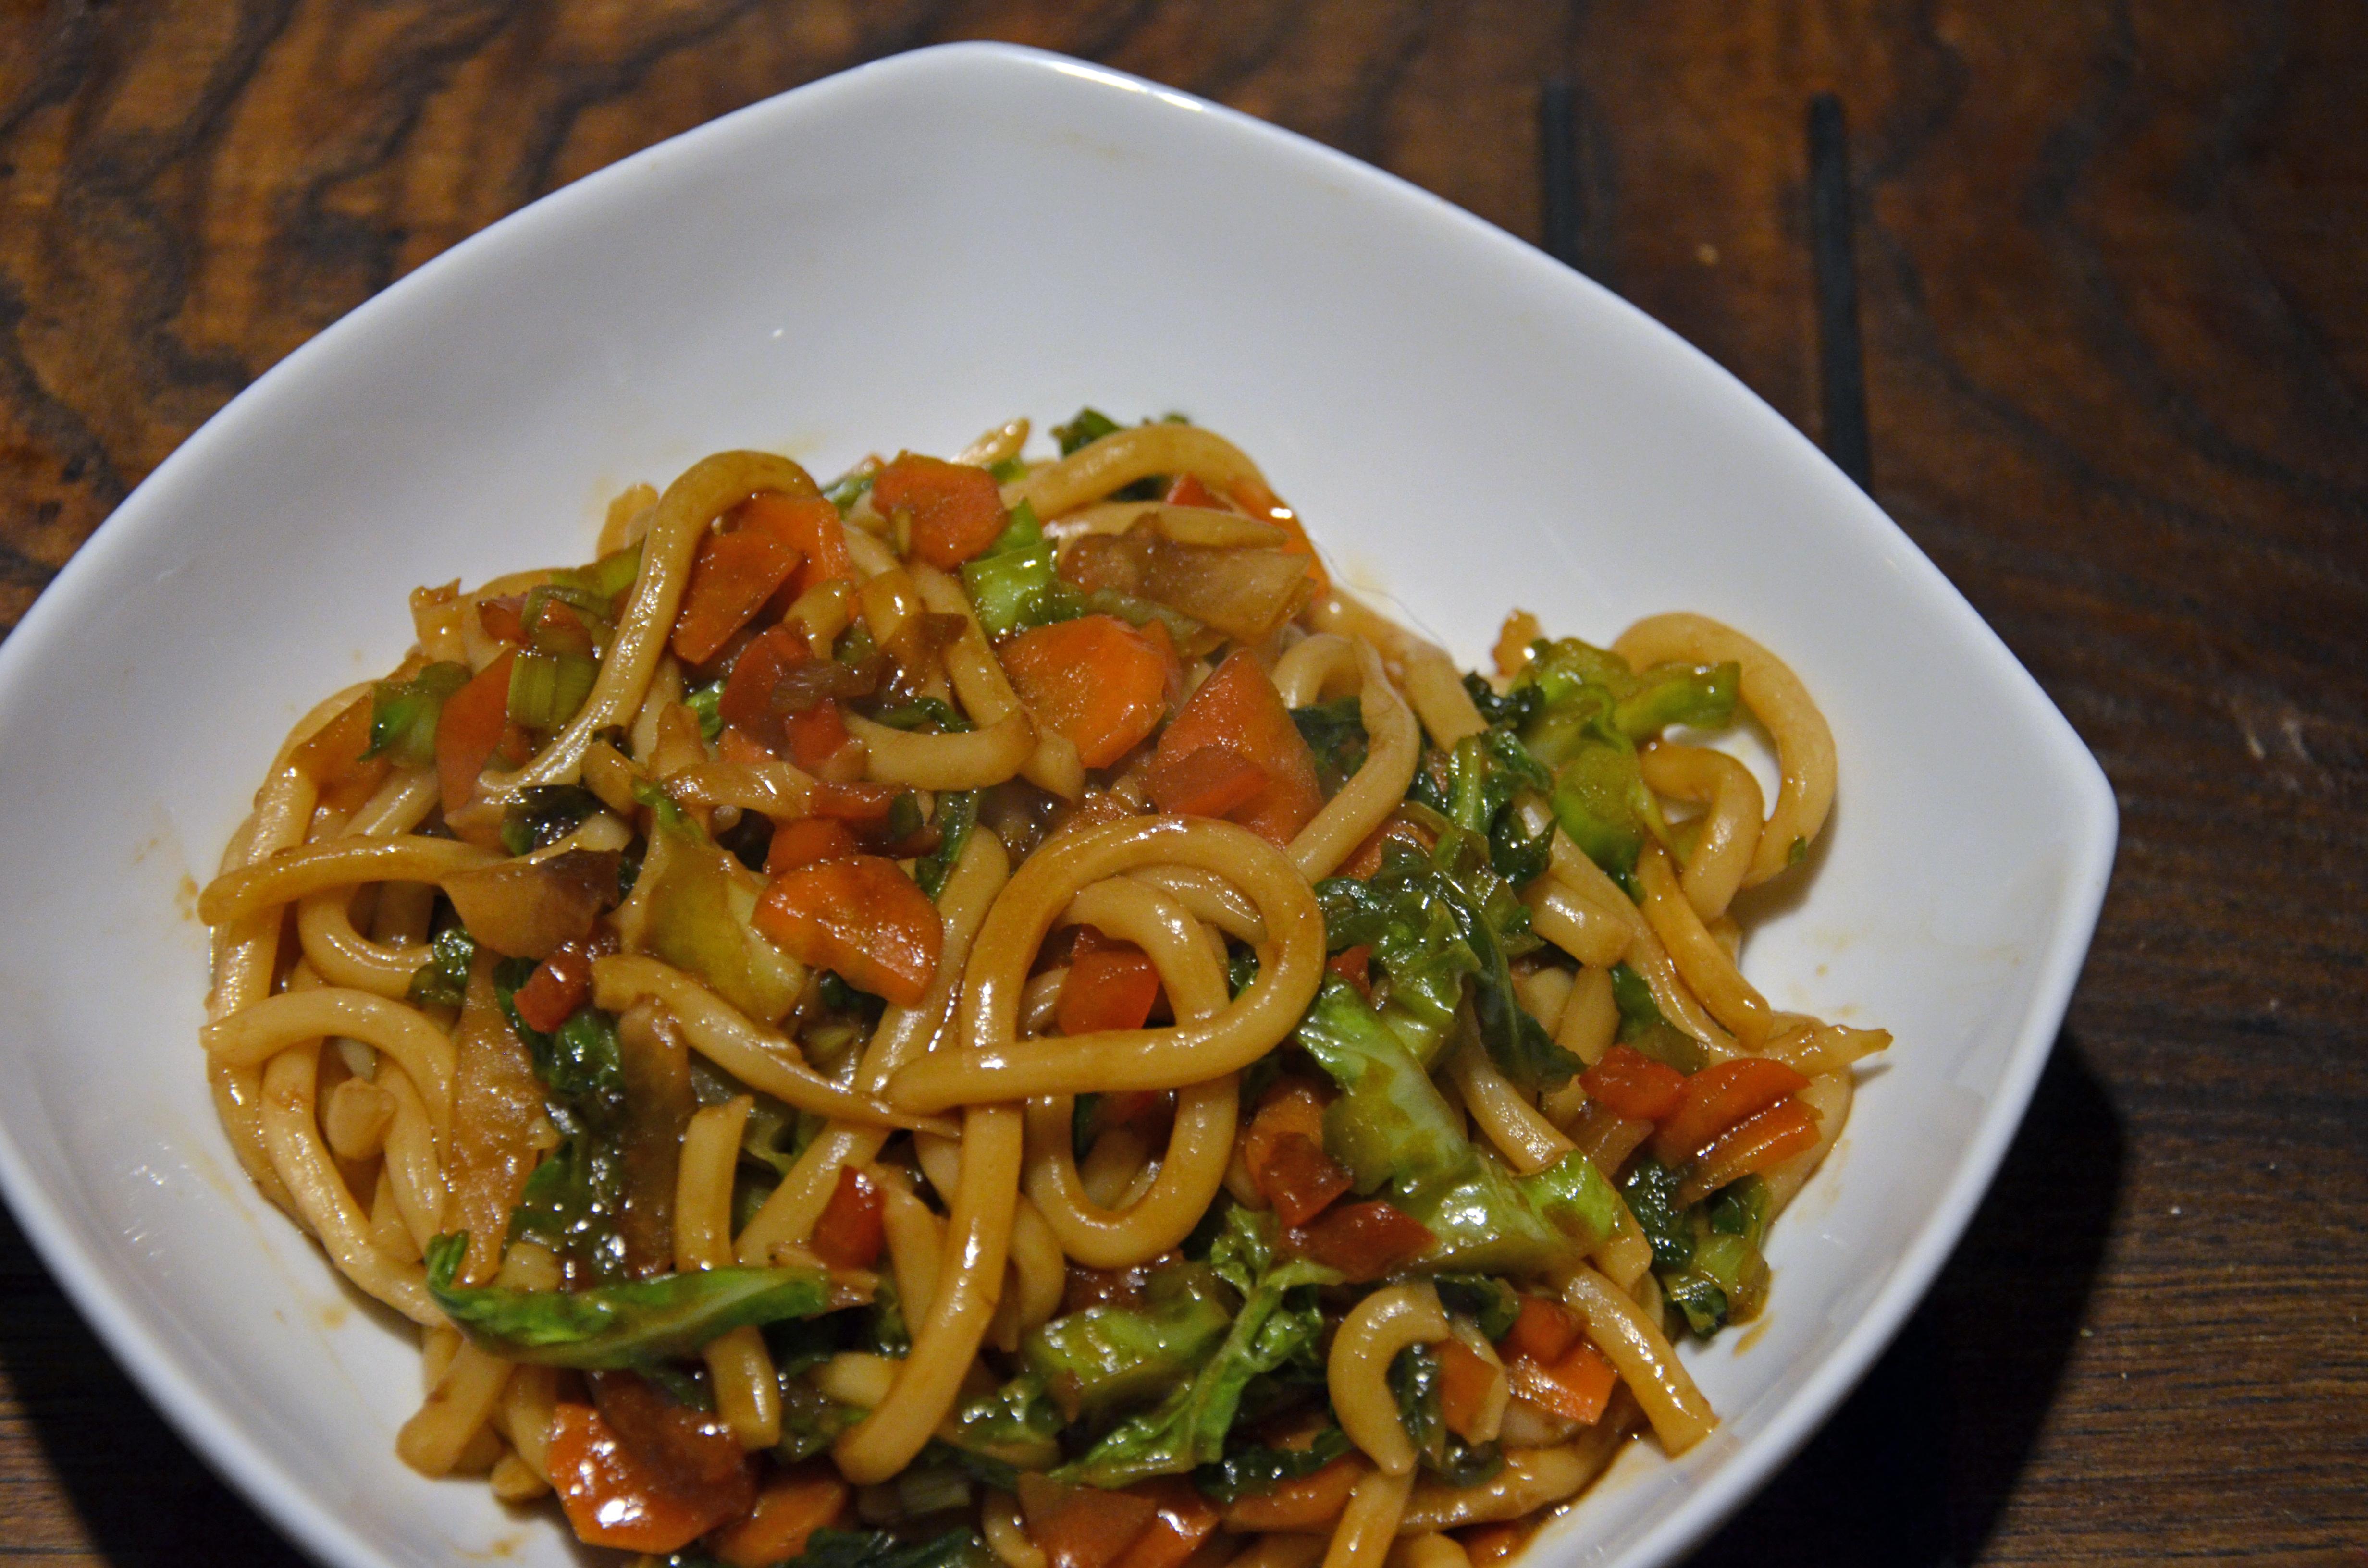 udon saltati con verdure croccanti